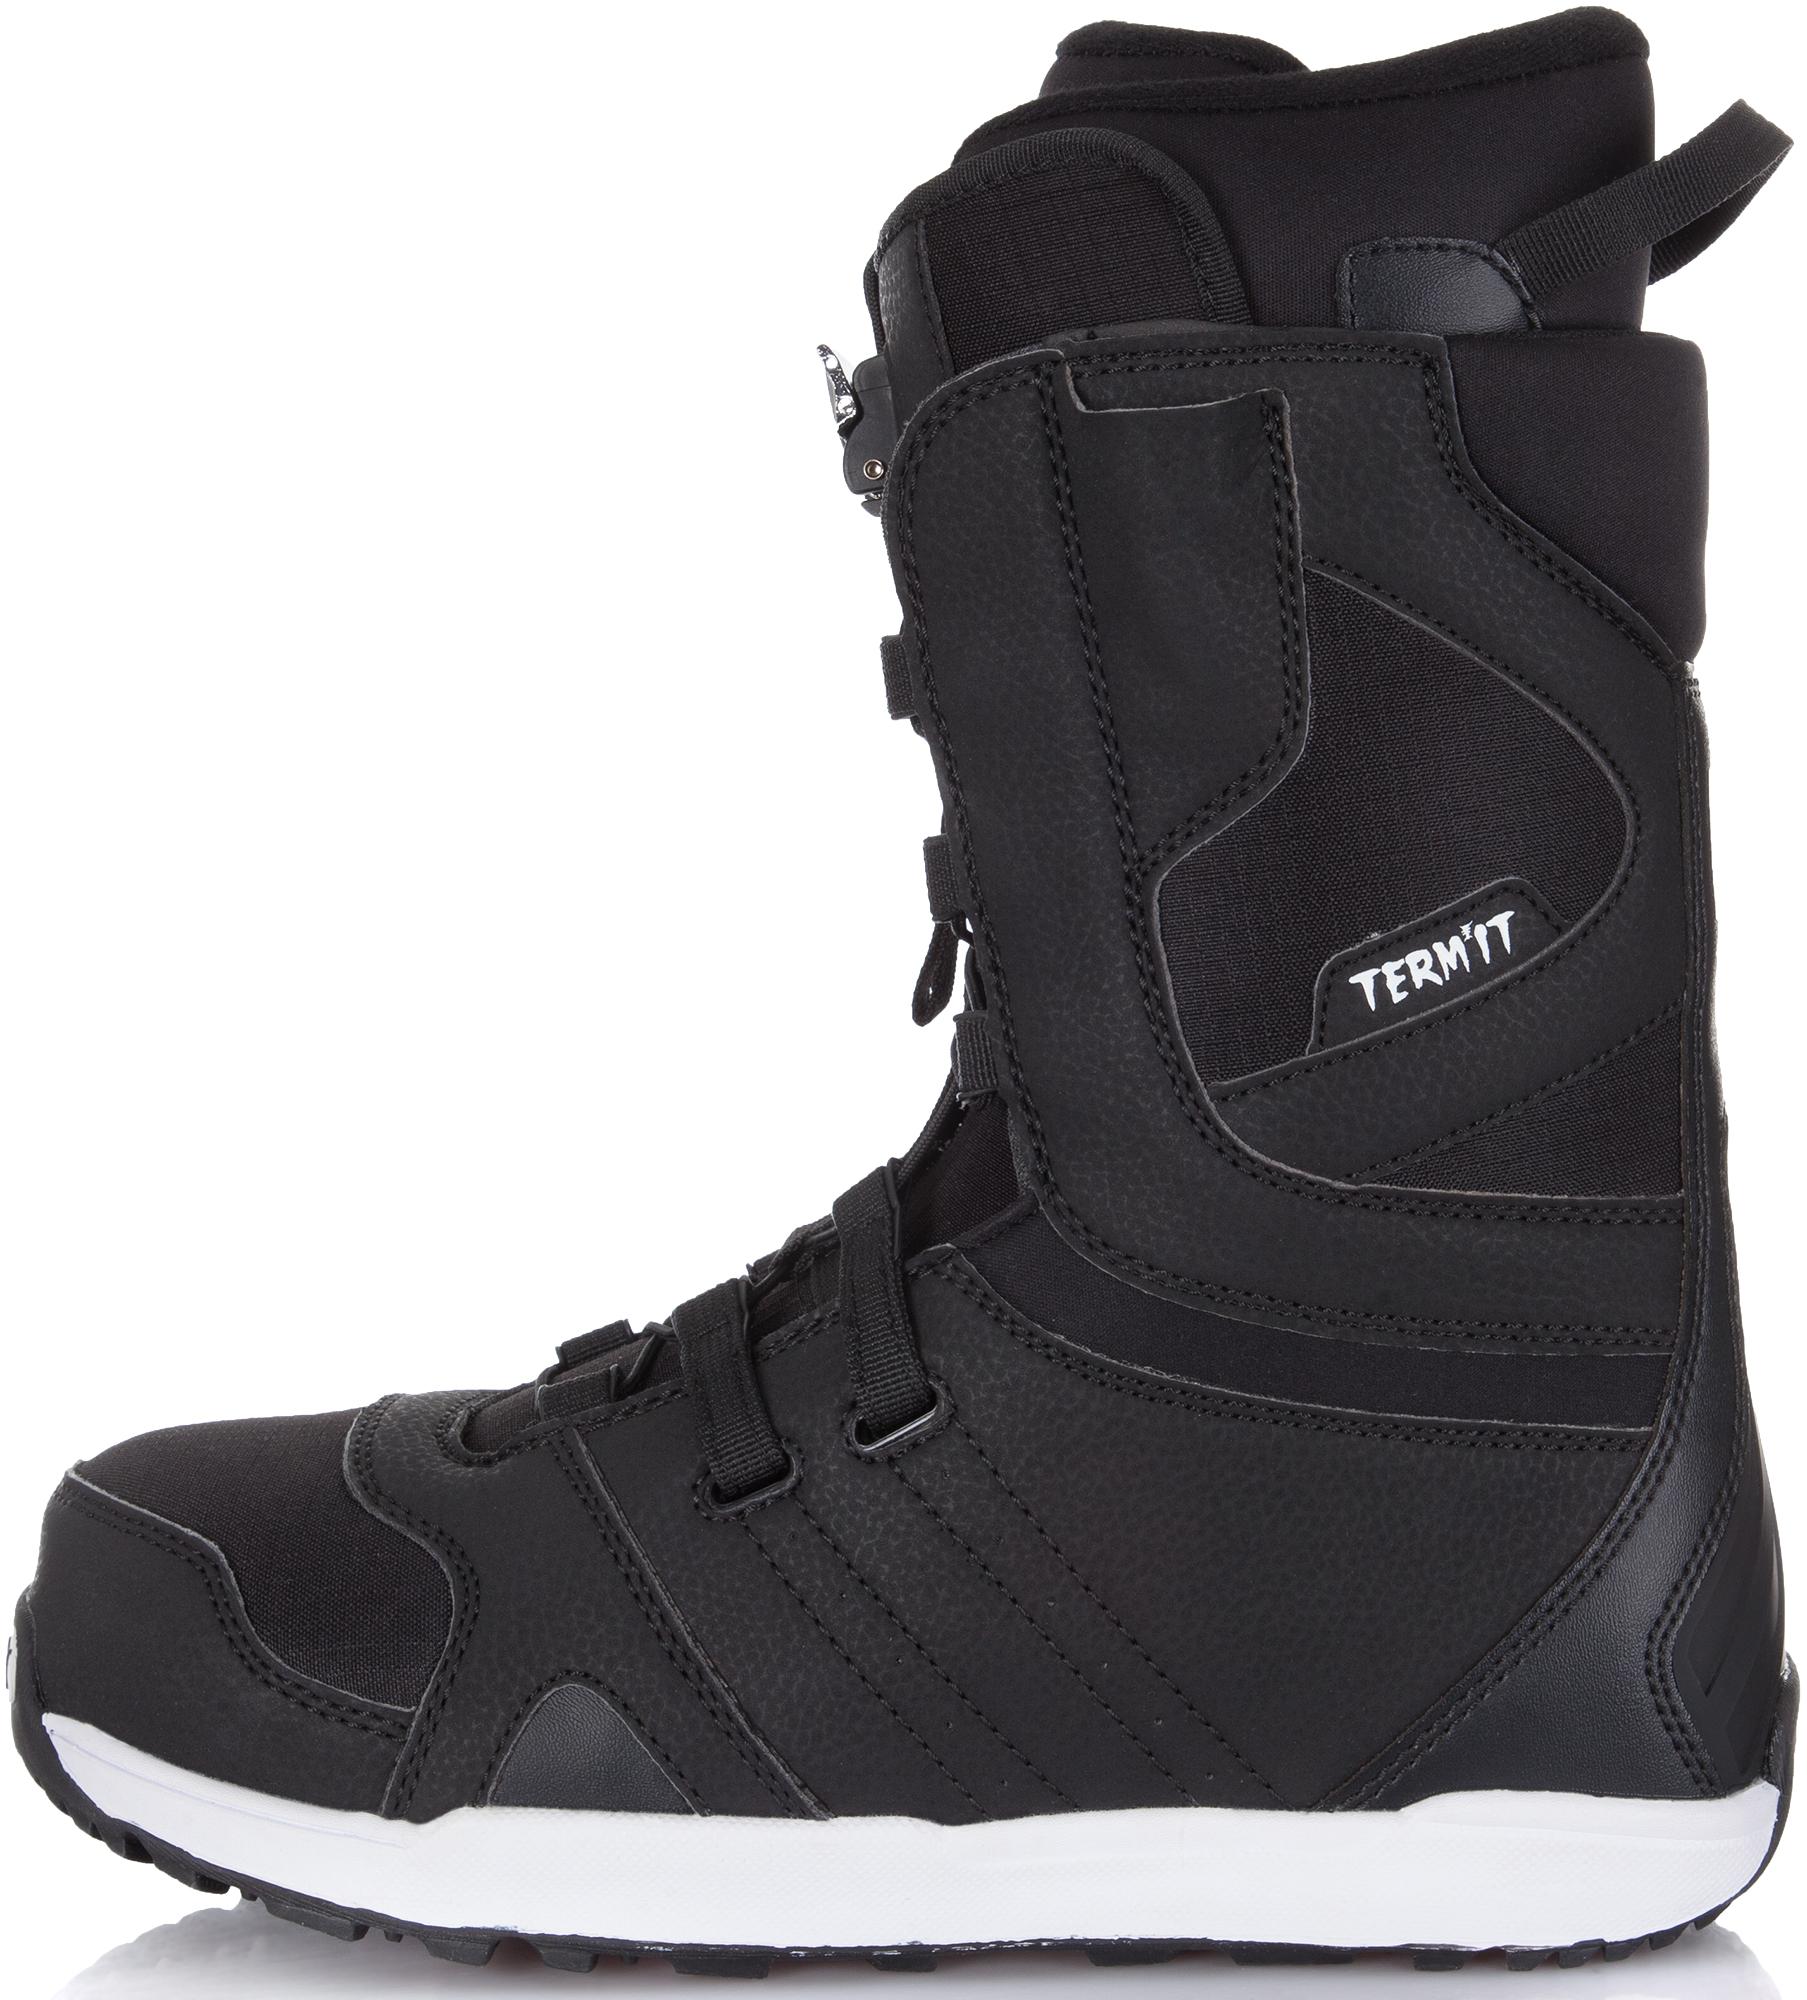 Termit Ботинки сноубордические Termit Trend, размер 43,5 цена